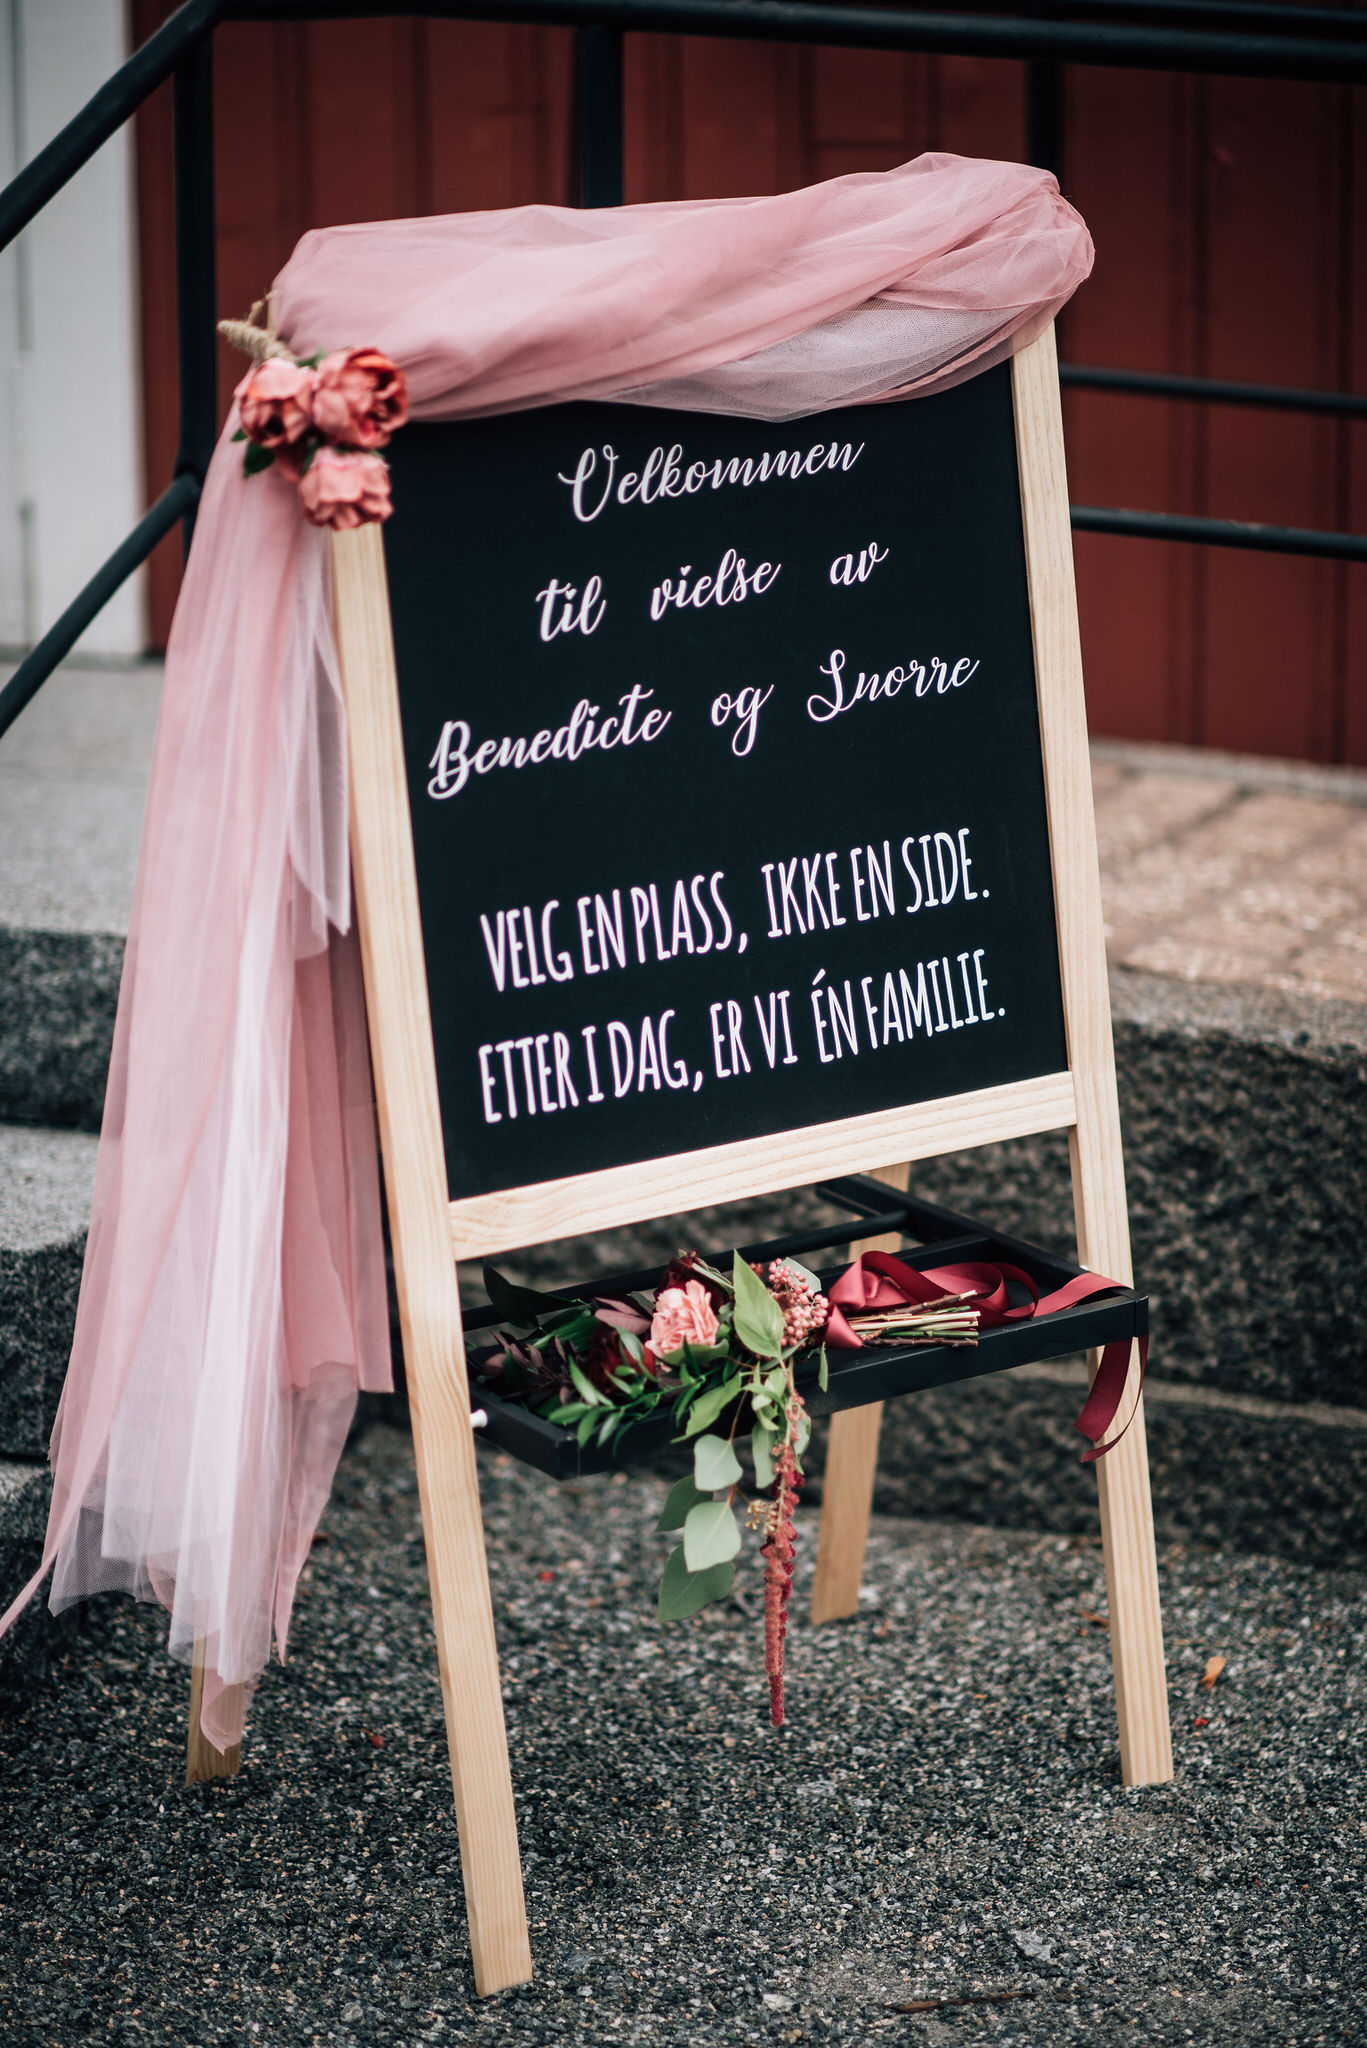 LMV_0104_fotografering_larvik_bryllup_aspargesgarden_.jpg